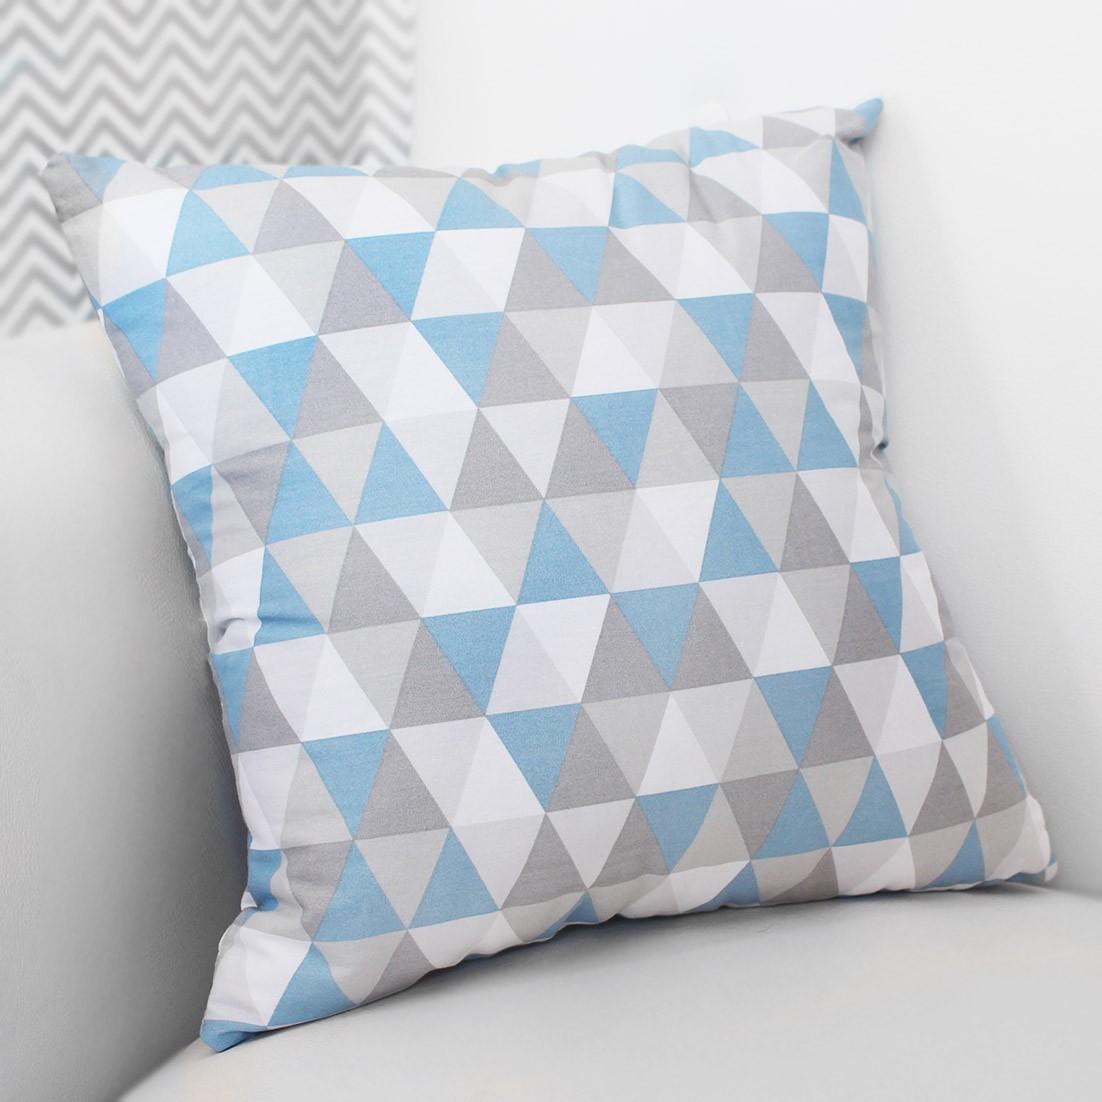 Almofada Decorativa Estampada - Losango Azul